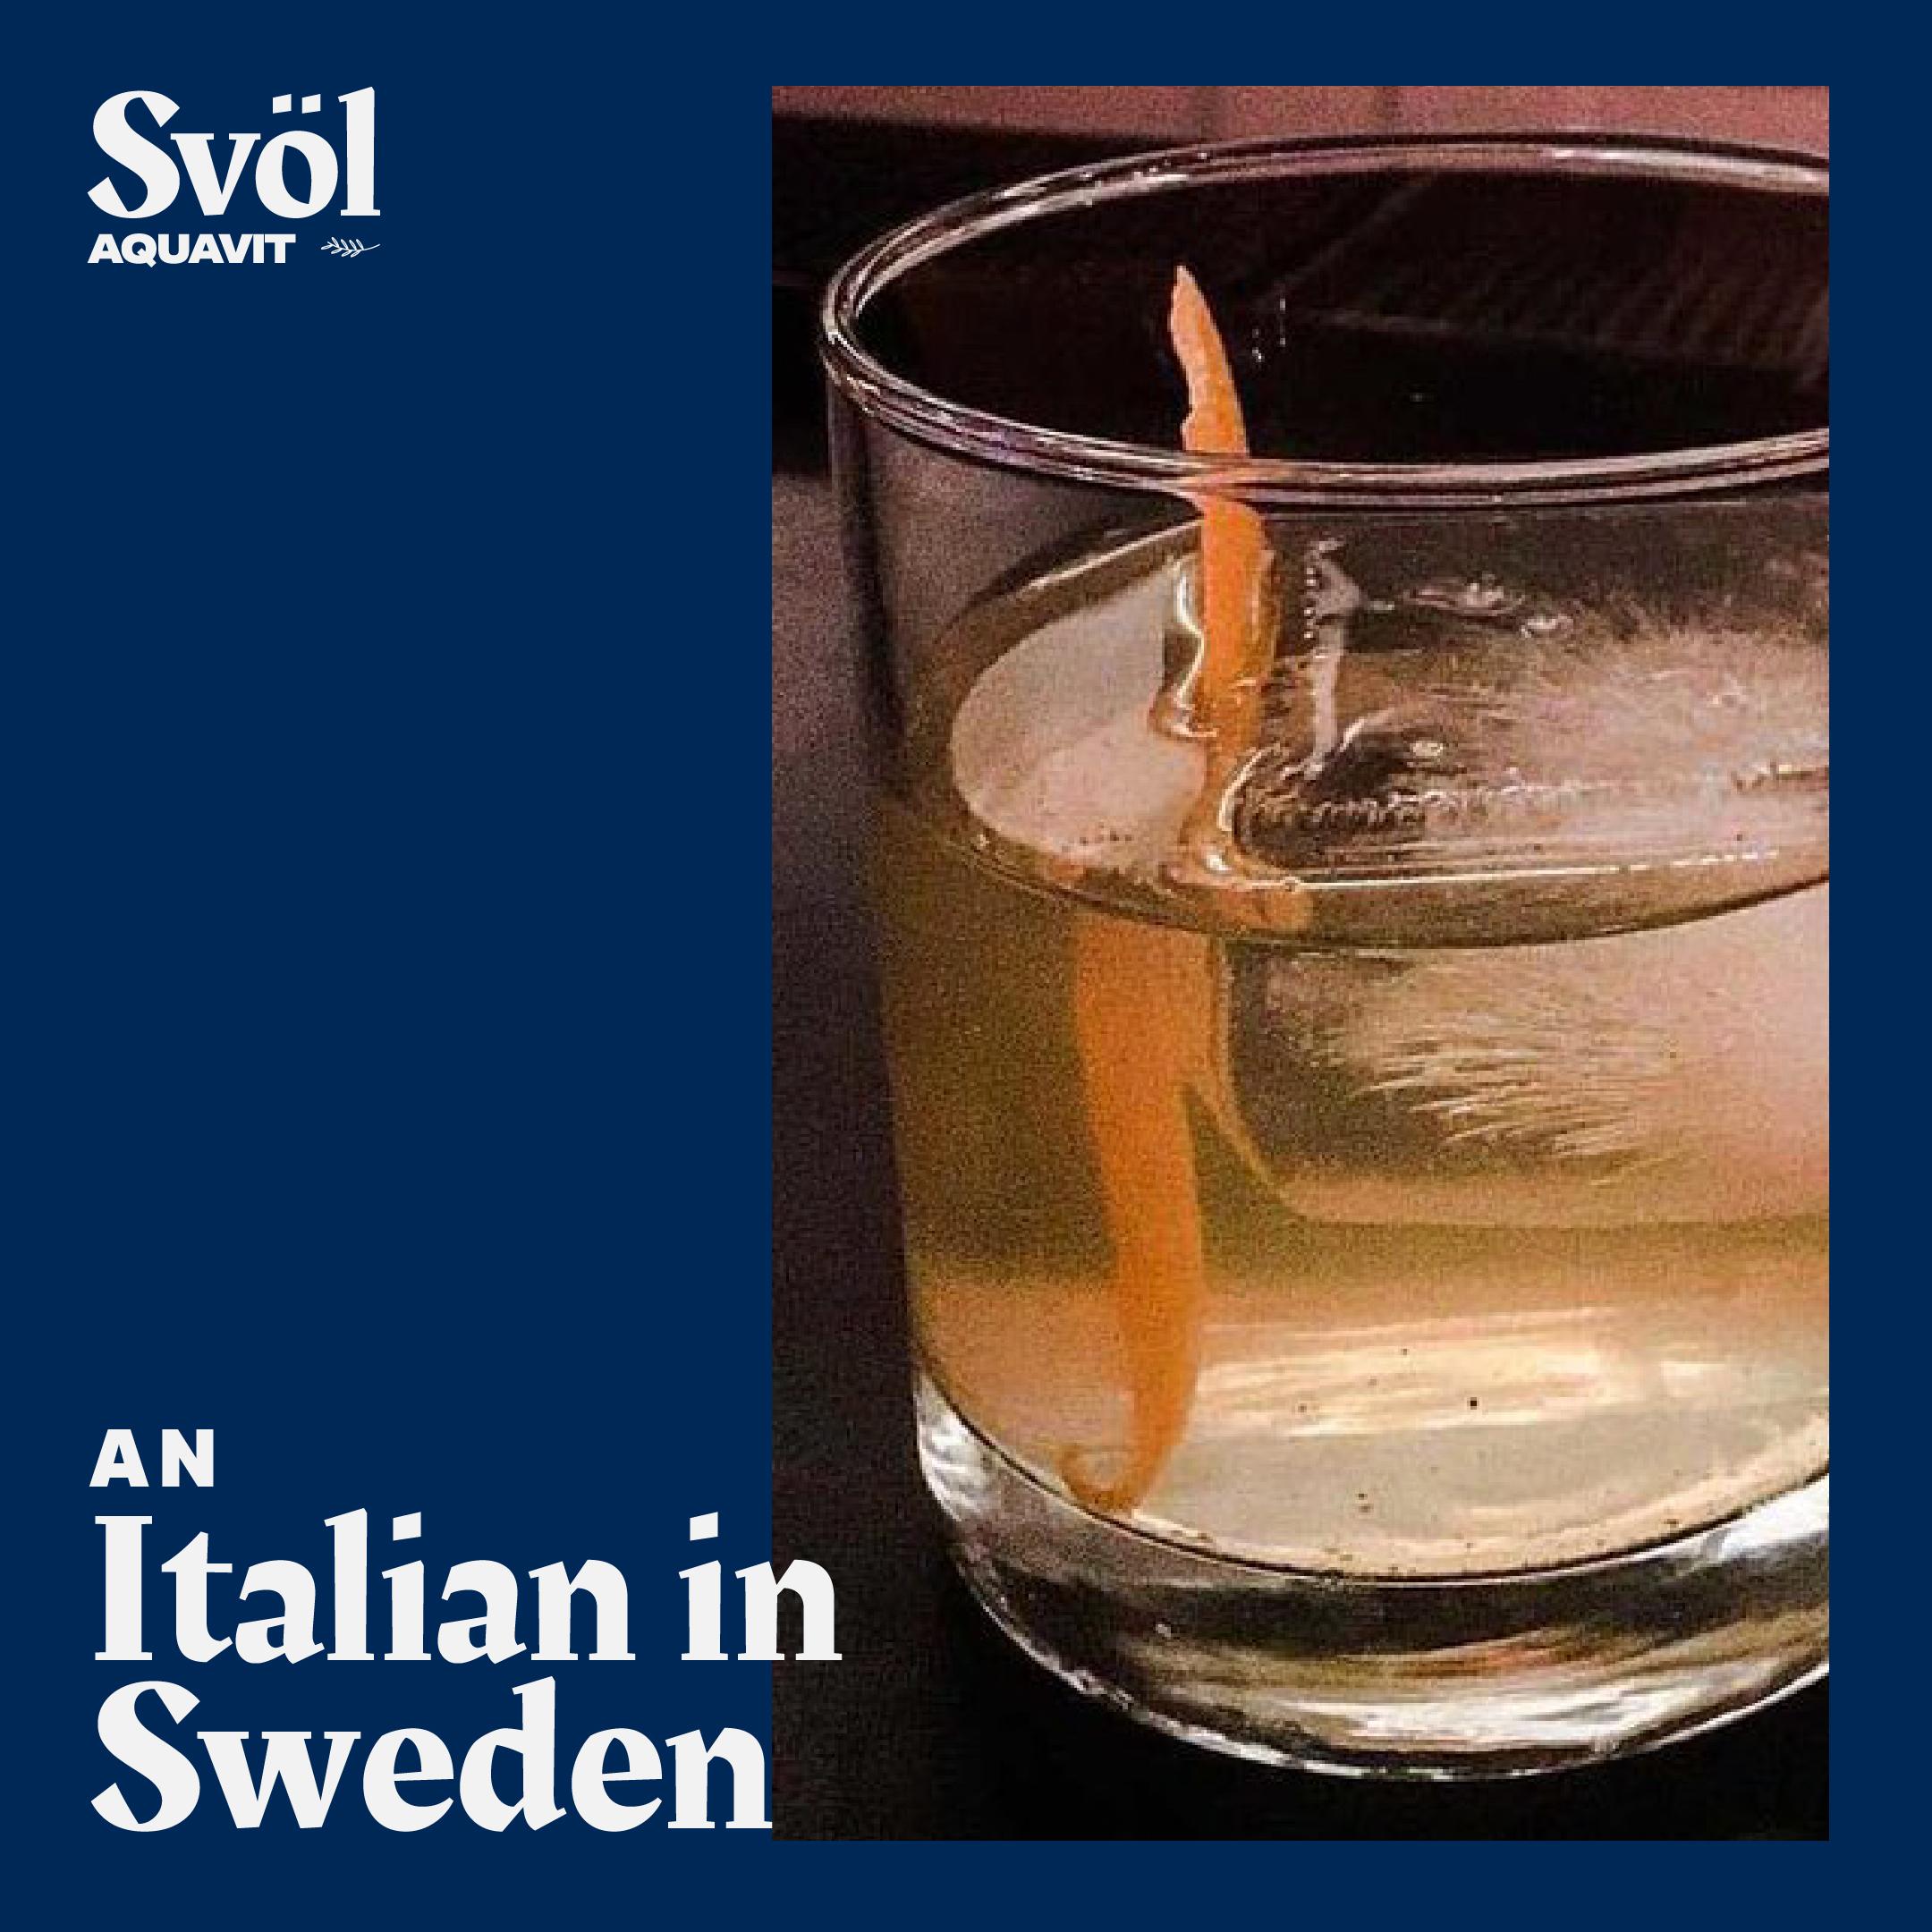 Svol_Cocktail_Template_AnItalianInSweden.jpg